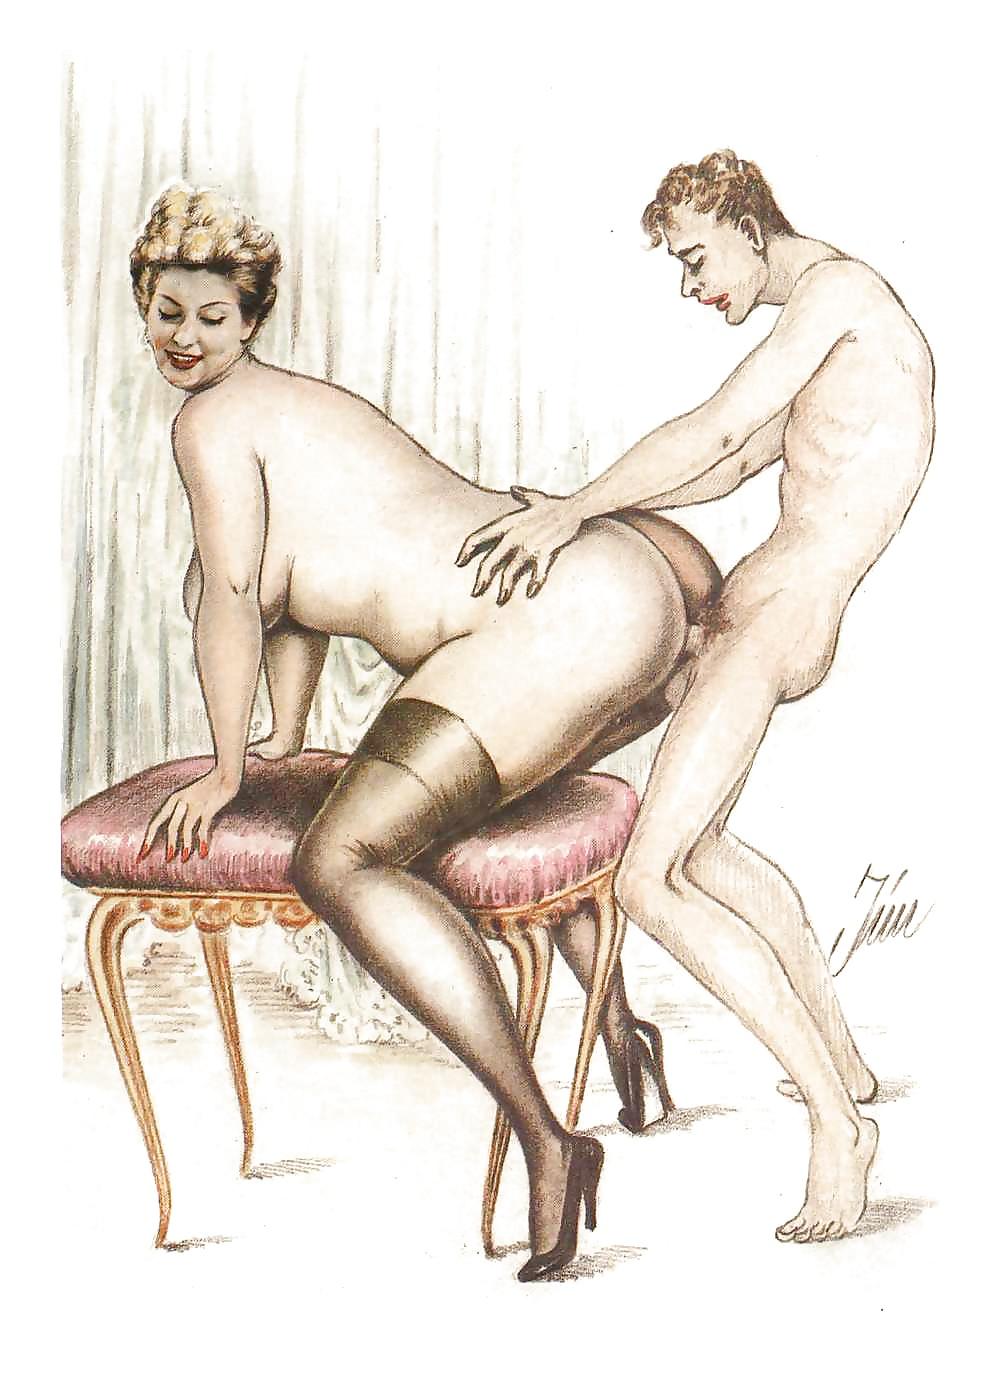 Древних старая эротика рисунки порно актриса фотографий